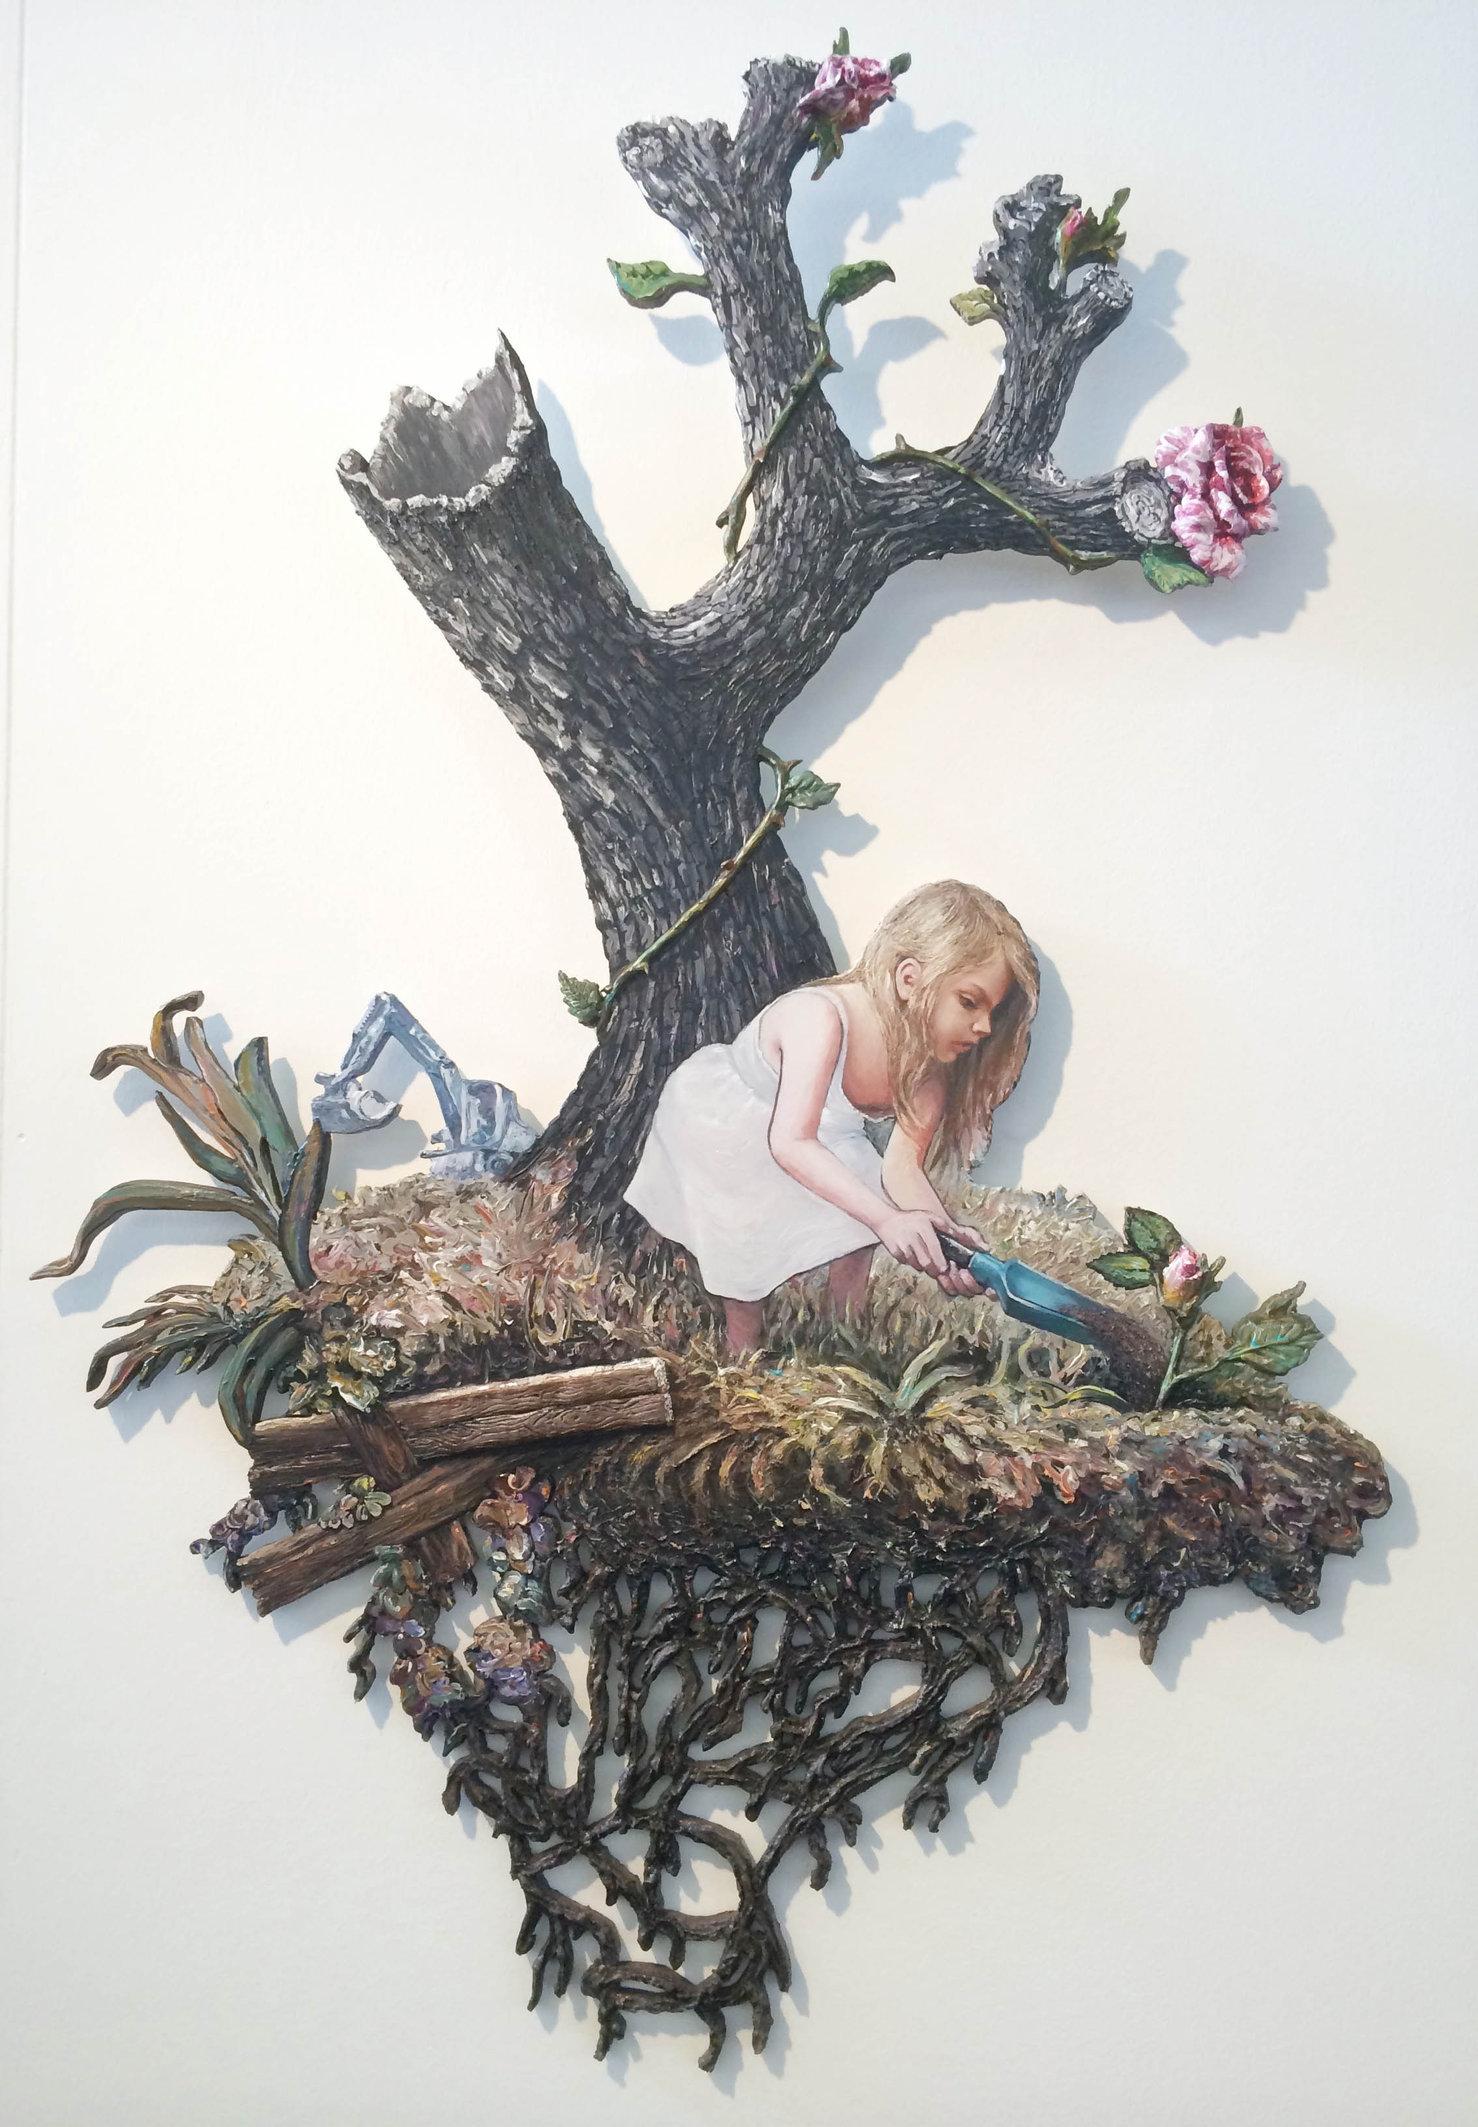 Patrick Bergsma, Aandacht/Attention, 2014